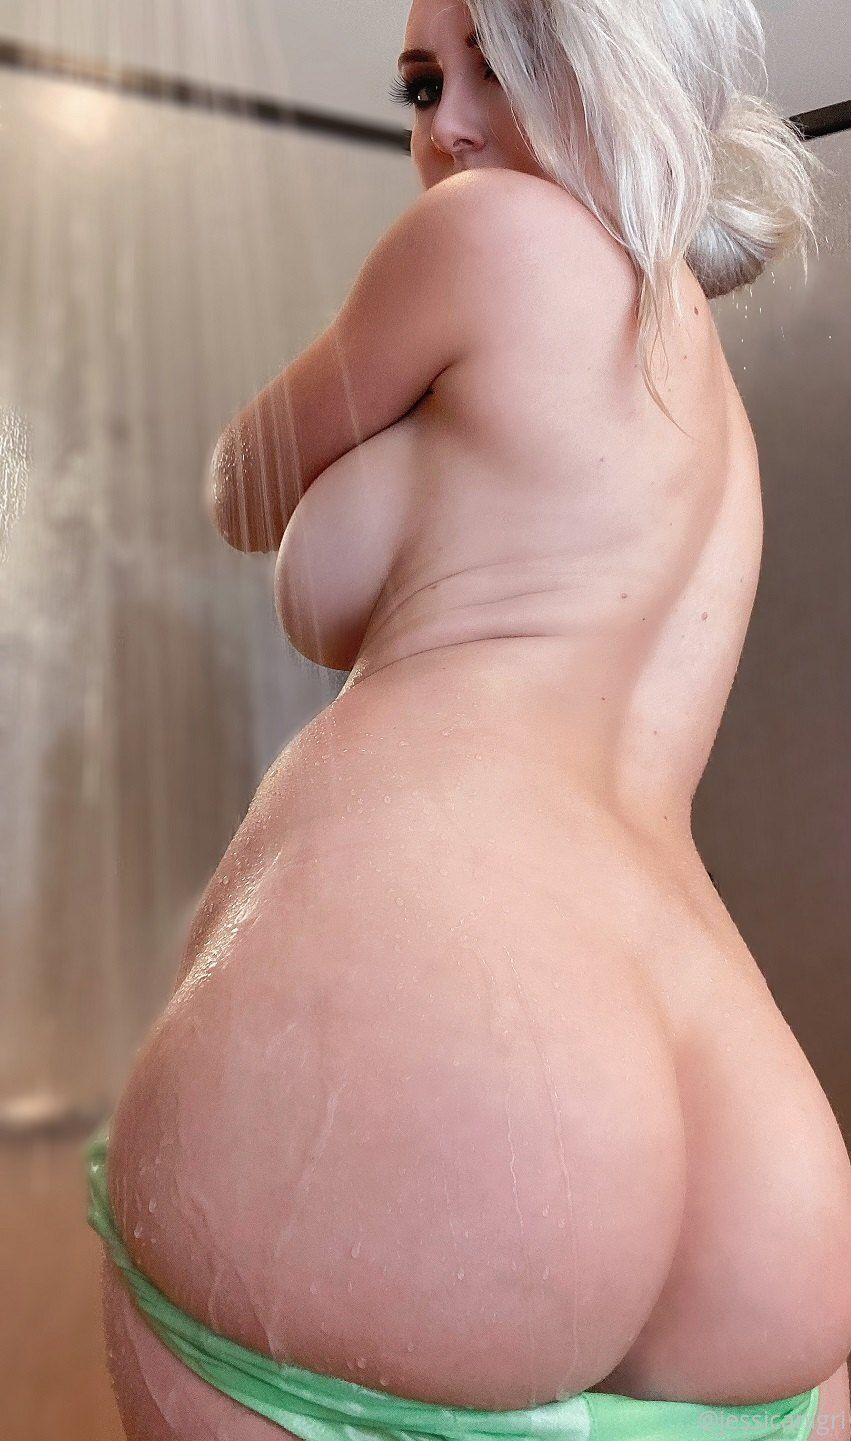 Jessica Nigri Shower Tits 0004